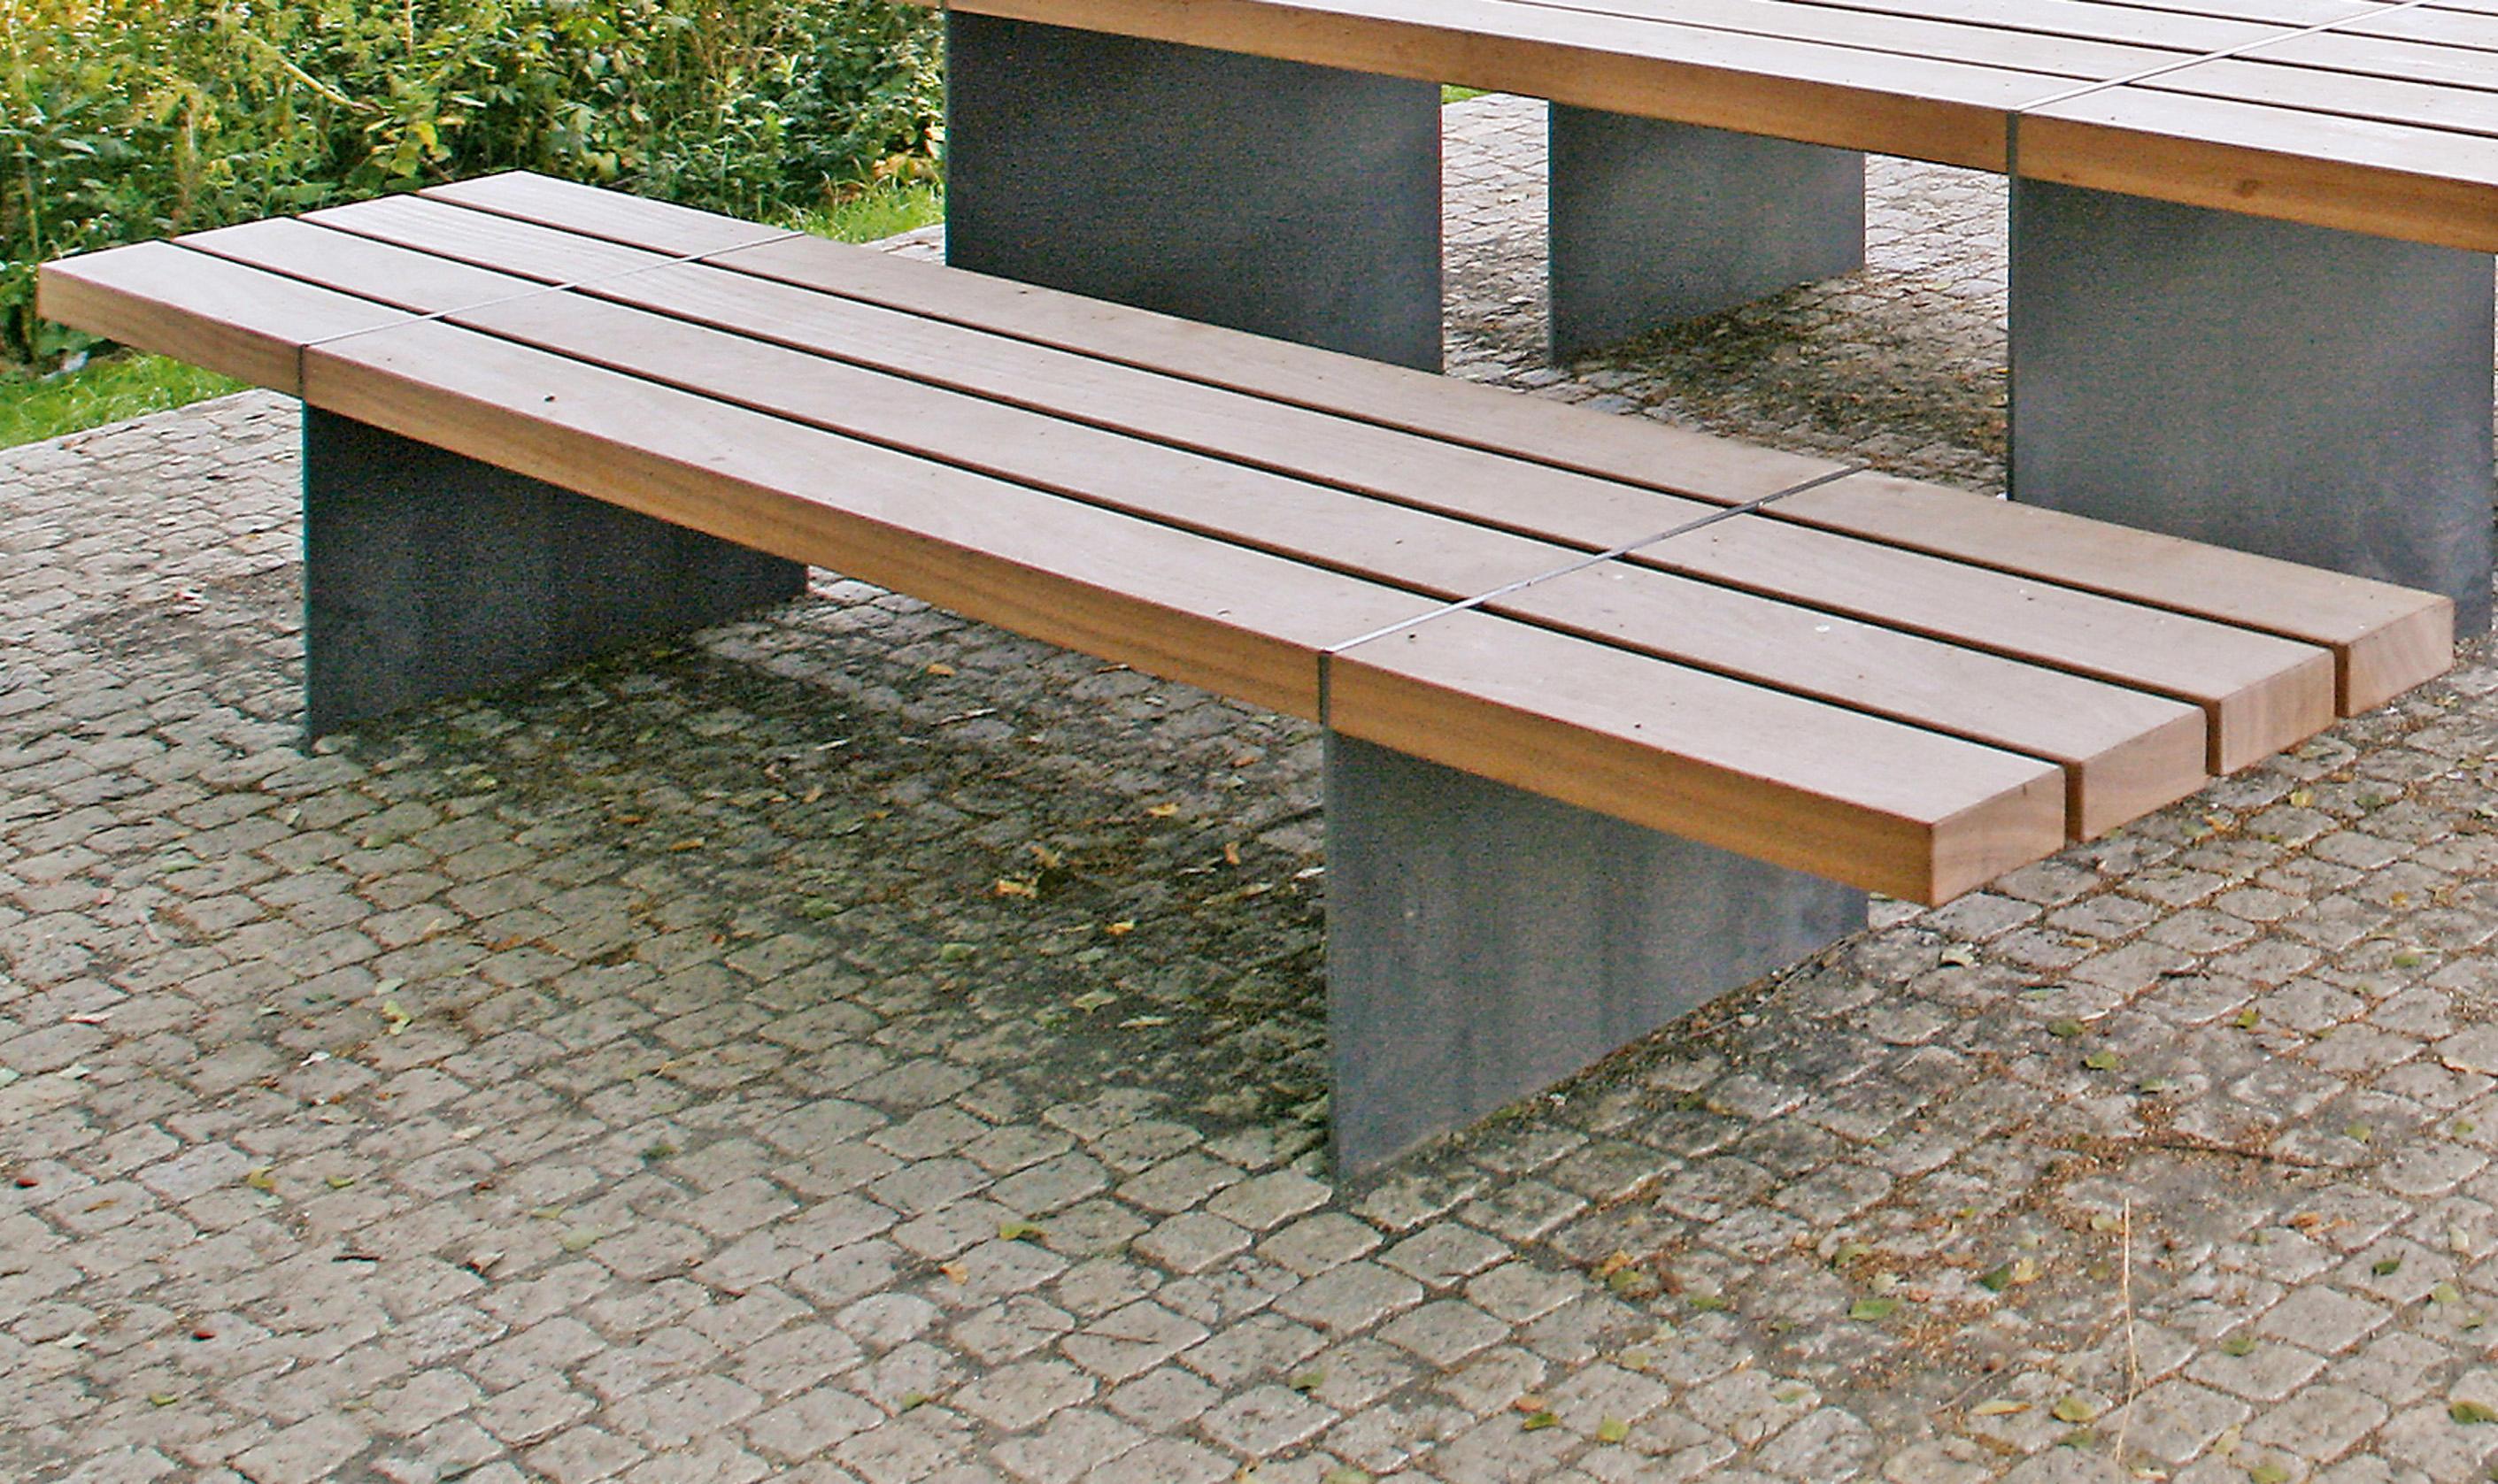 Tecto stoolbench 65 cm bancos de exterior de westeifel - Bancos para exterior ...